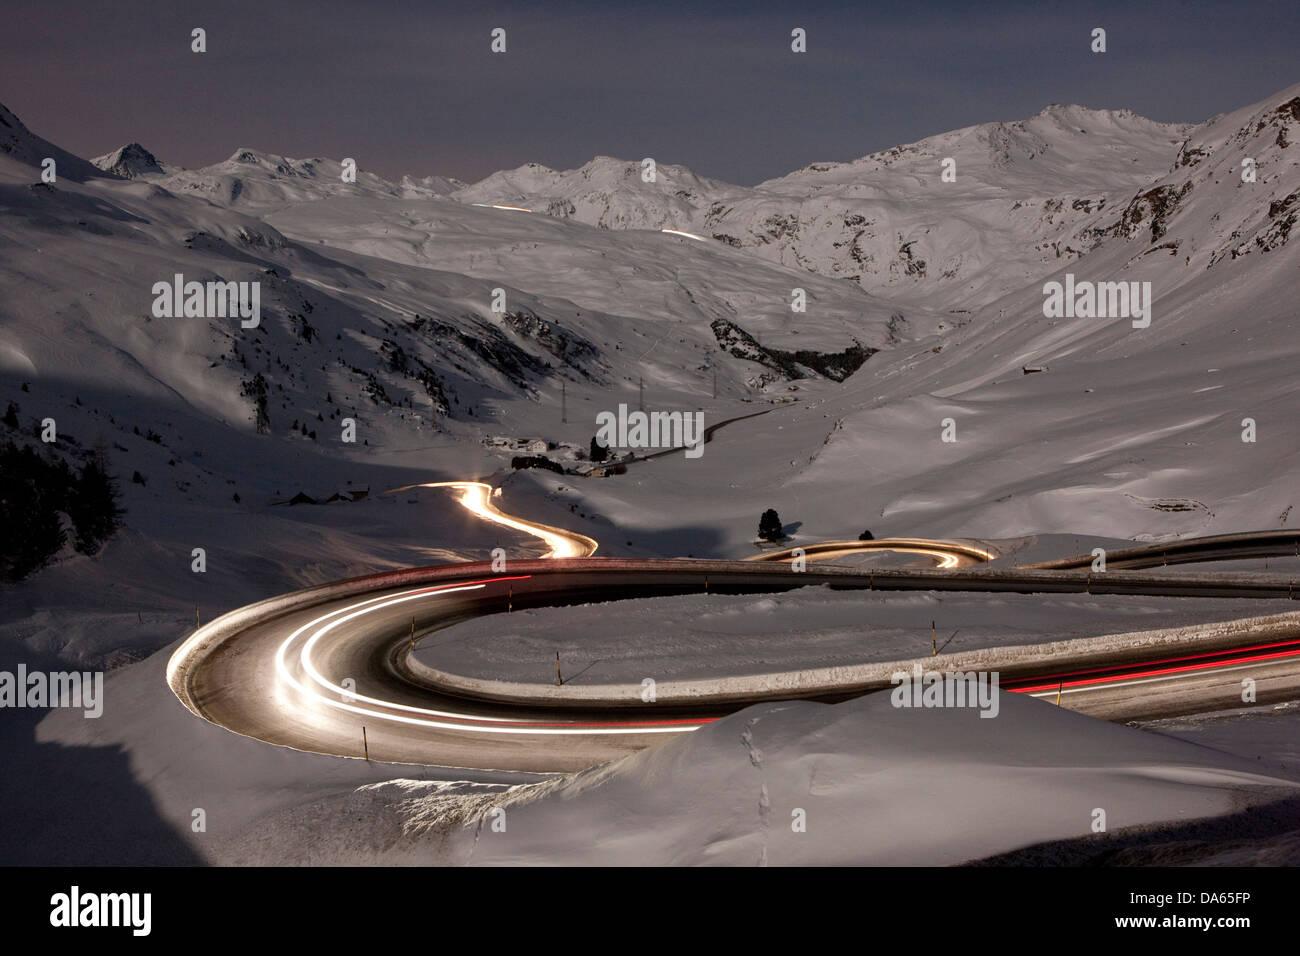 Julier, mountain pass, Pass, street, night, dark, traffic, transport, canton, GR, Graubünden, Grisons, Switzerland, - Stock Image